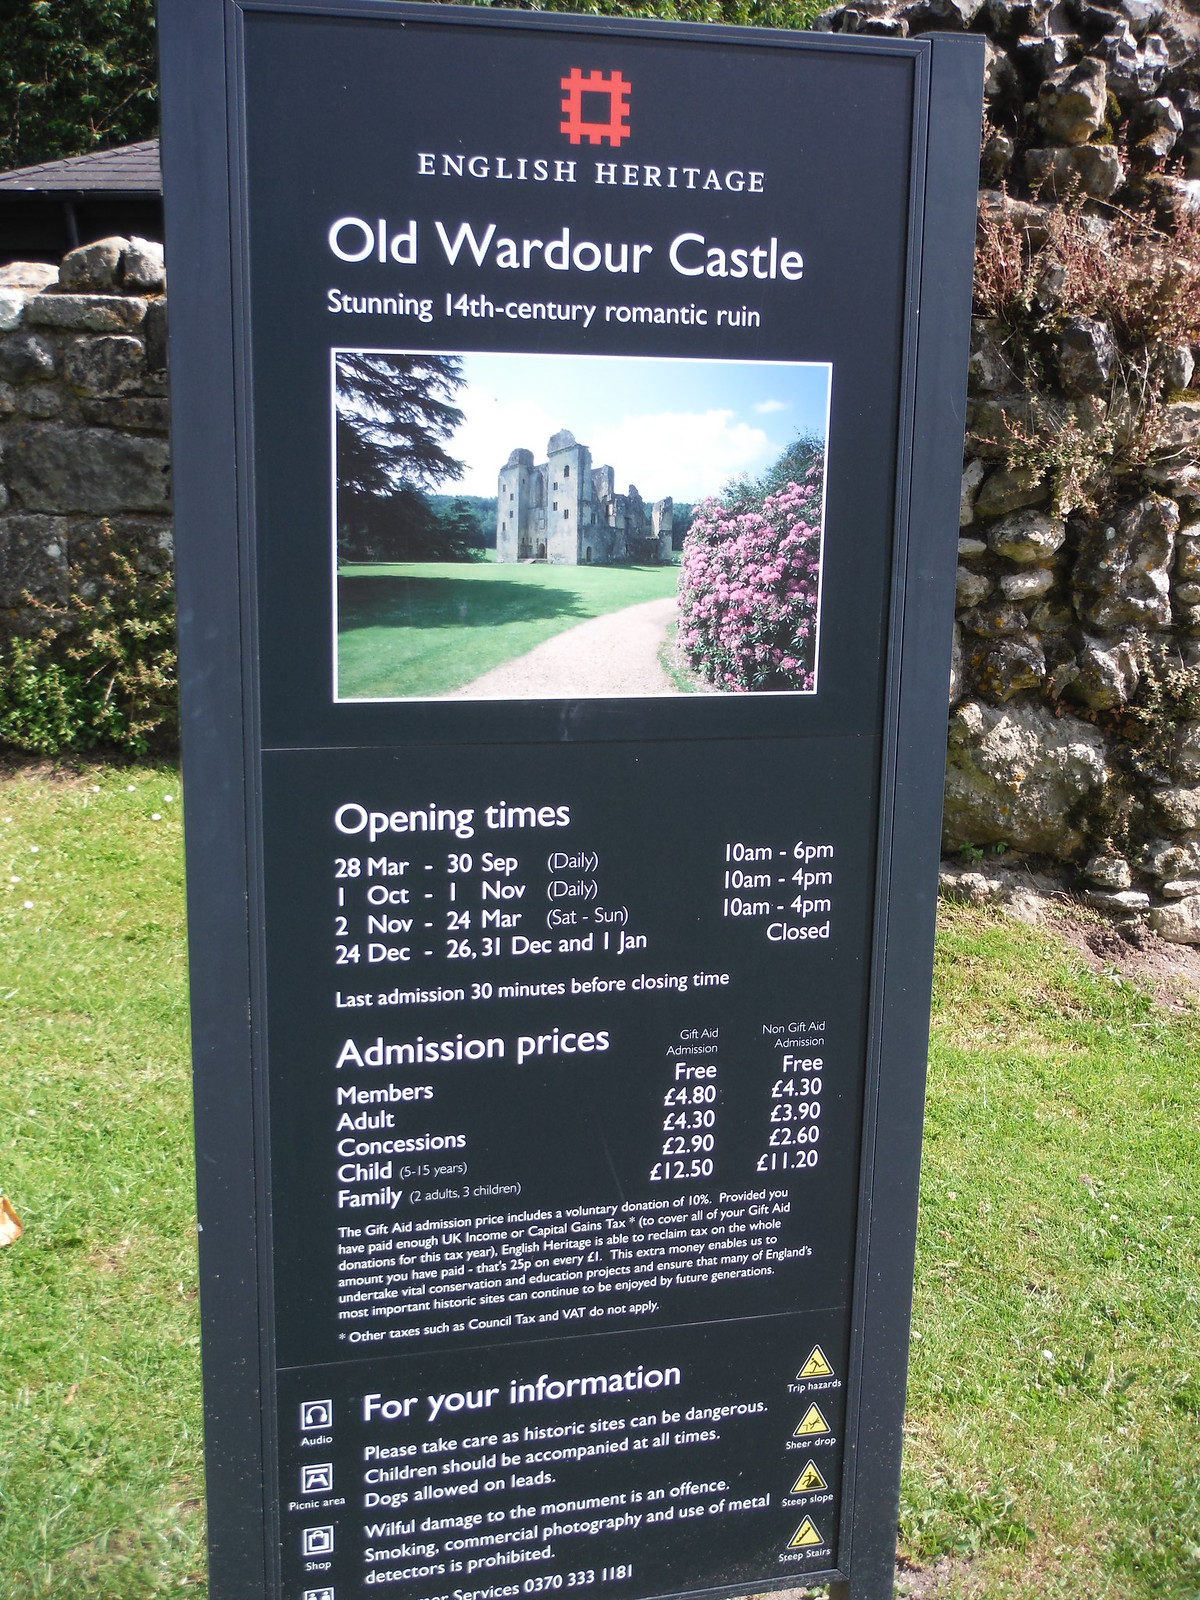 English Heritage Info, Old Wardour Castle SWC Walk 252 Tisbury Circular via Donhead St. Andrew